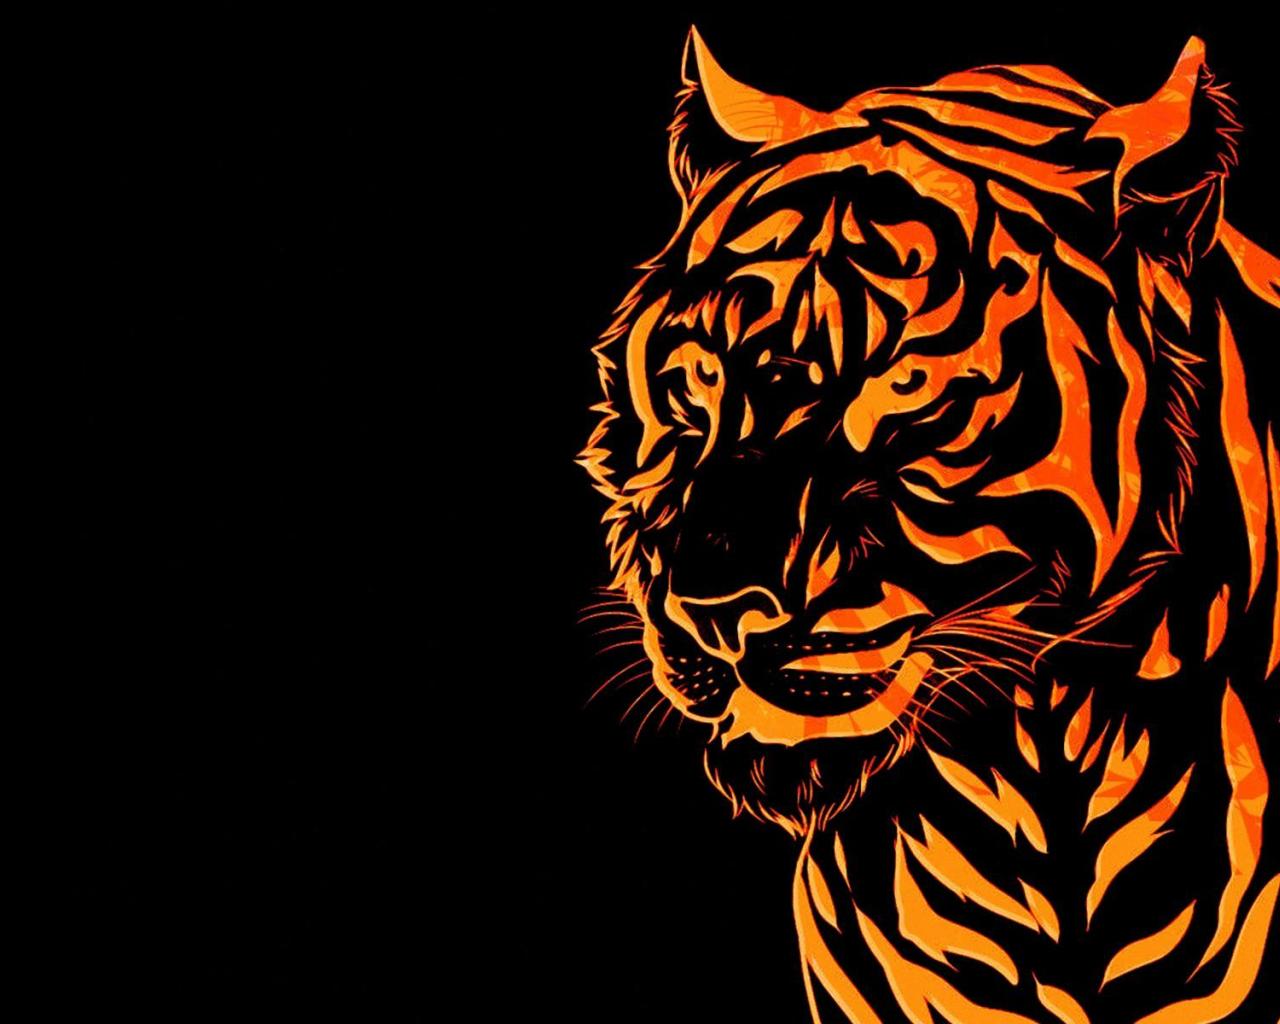 Free Download Images Of Black Lion Wallpaper Download 3d Hd Colour Design 1920x1200 For Your Desktop Mobile Tablet Explore 45 Black Lion Wallpaper White Lion Wallpaper Lion Wallpaper Hd